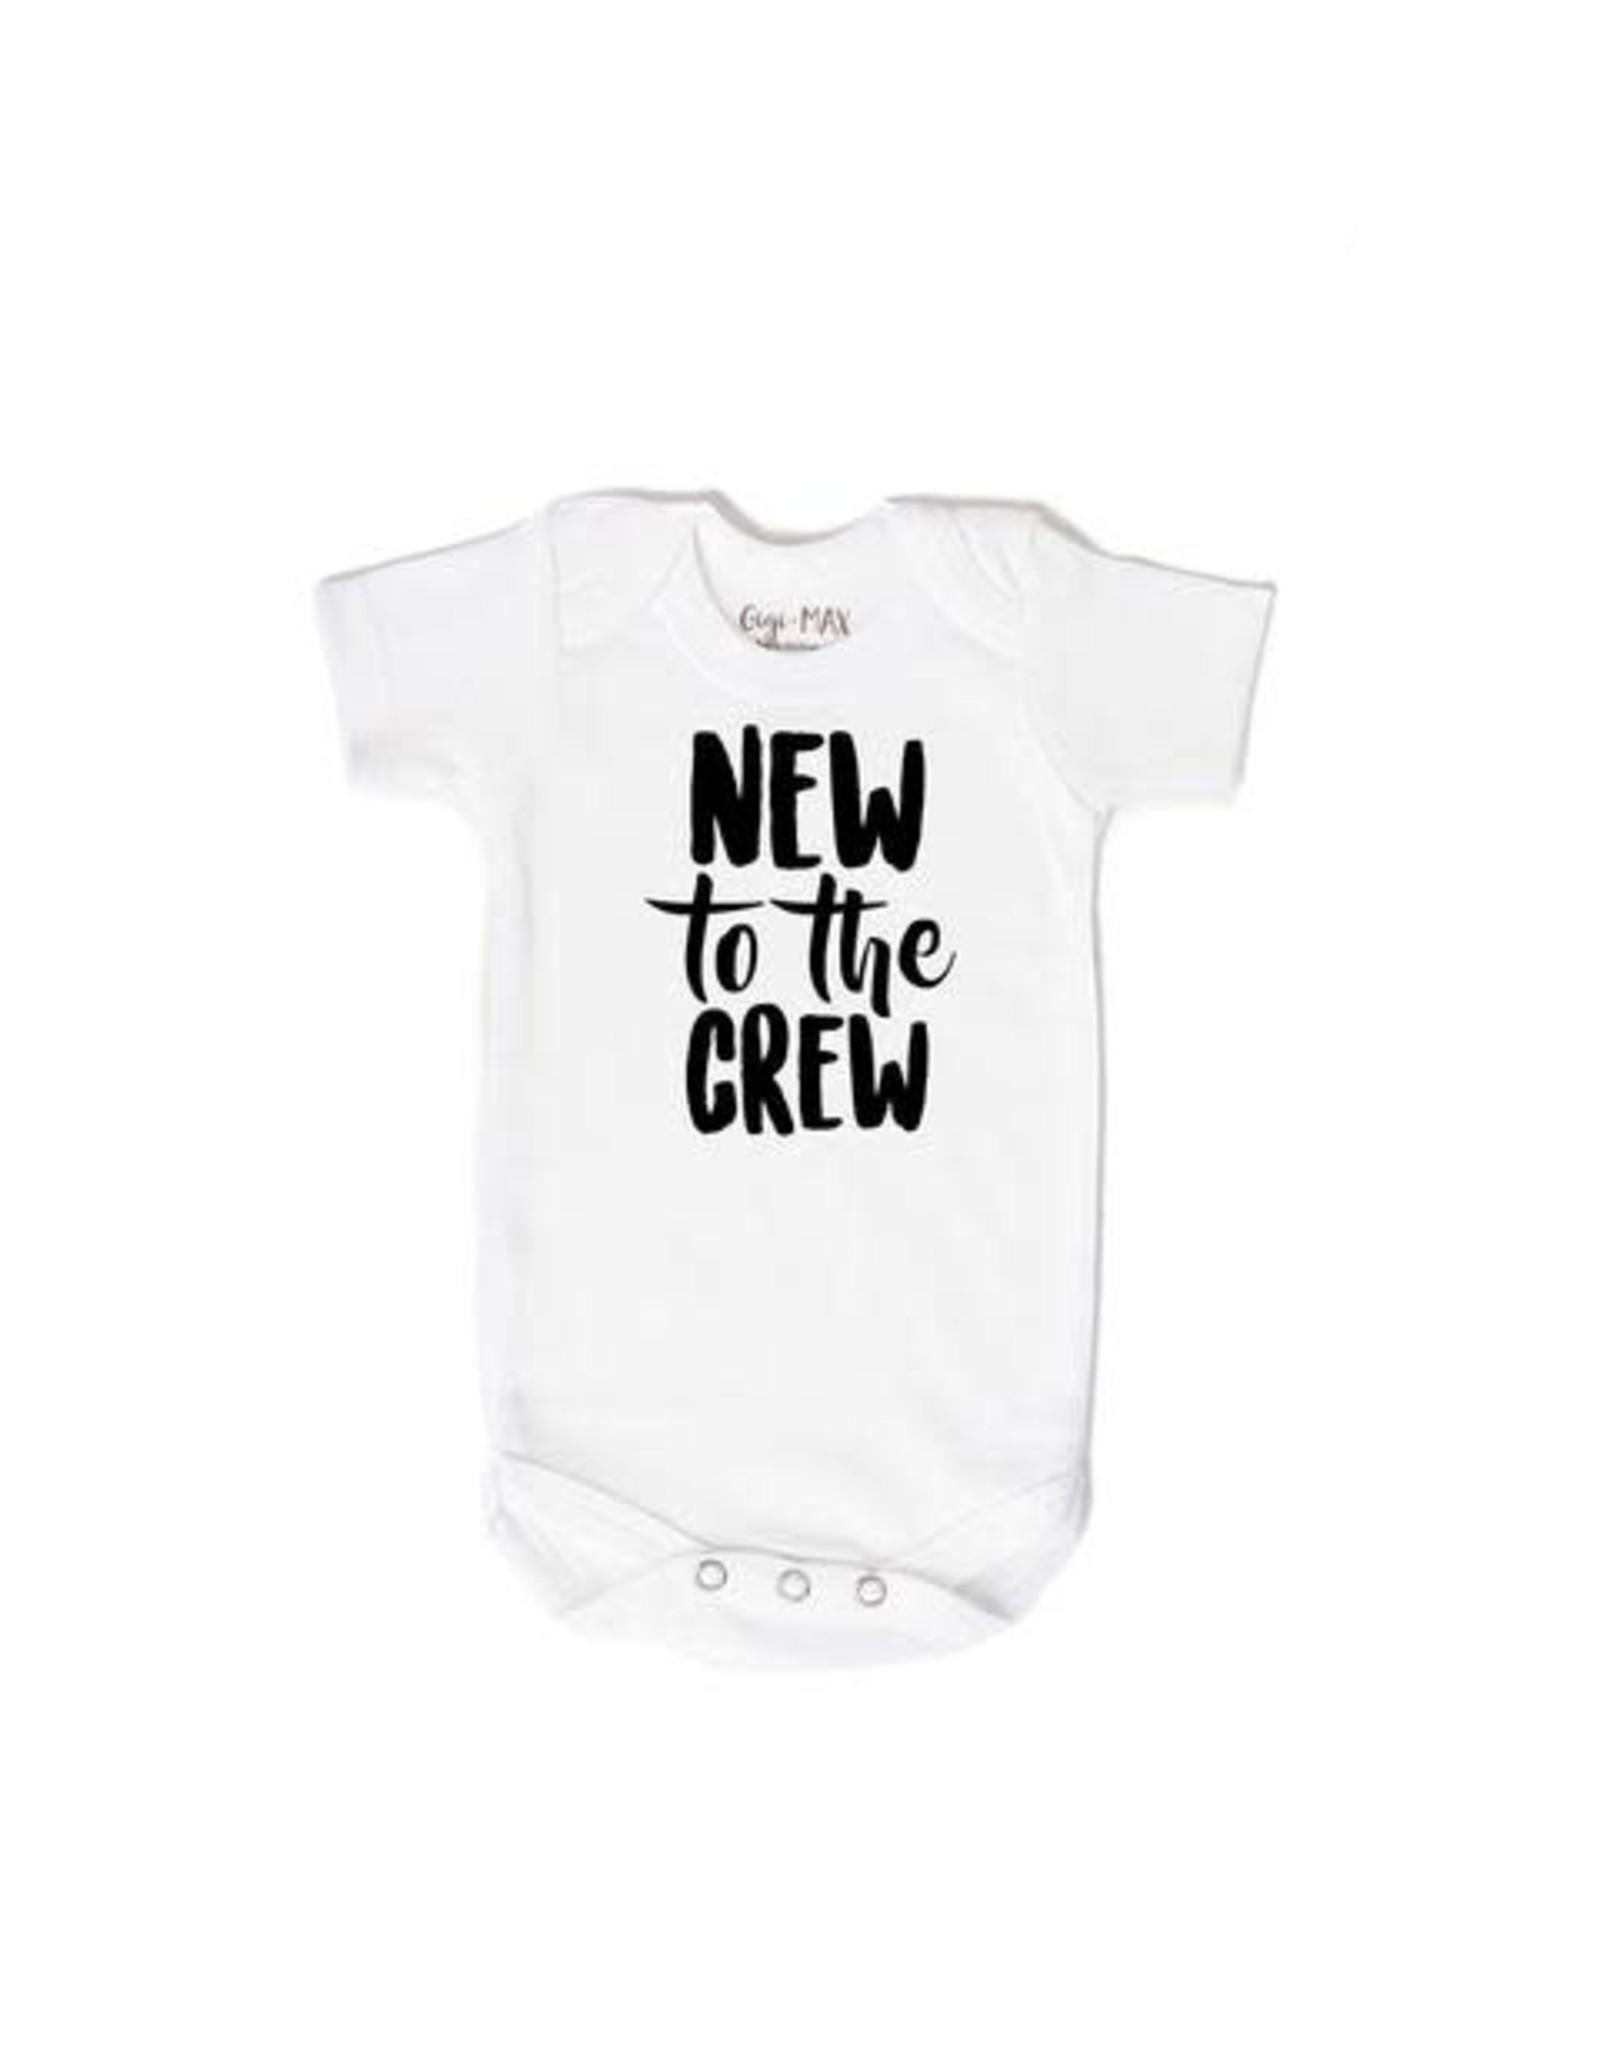 Gigi & Max Gigi & Max- New to the Crew S/S Newborn Onesie: Black